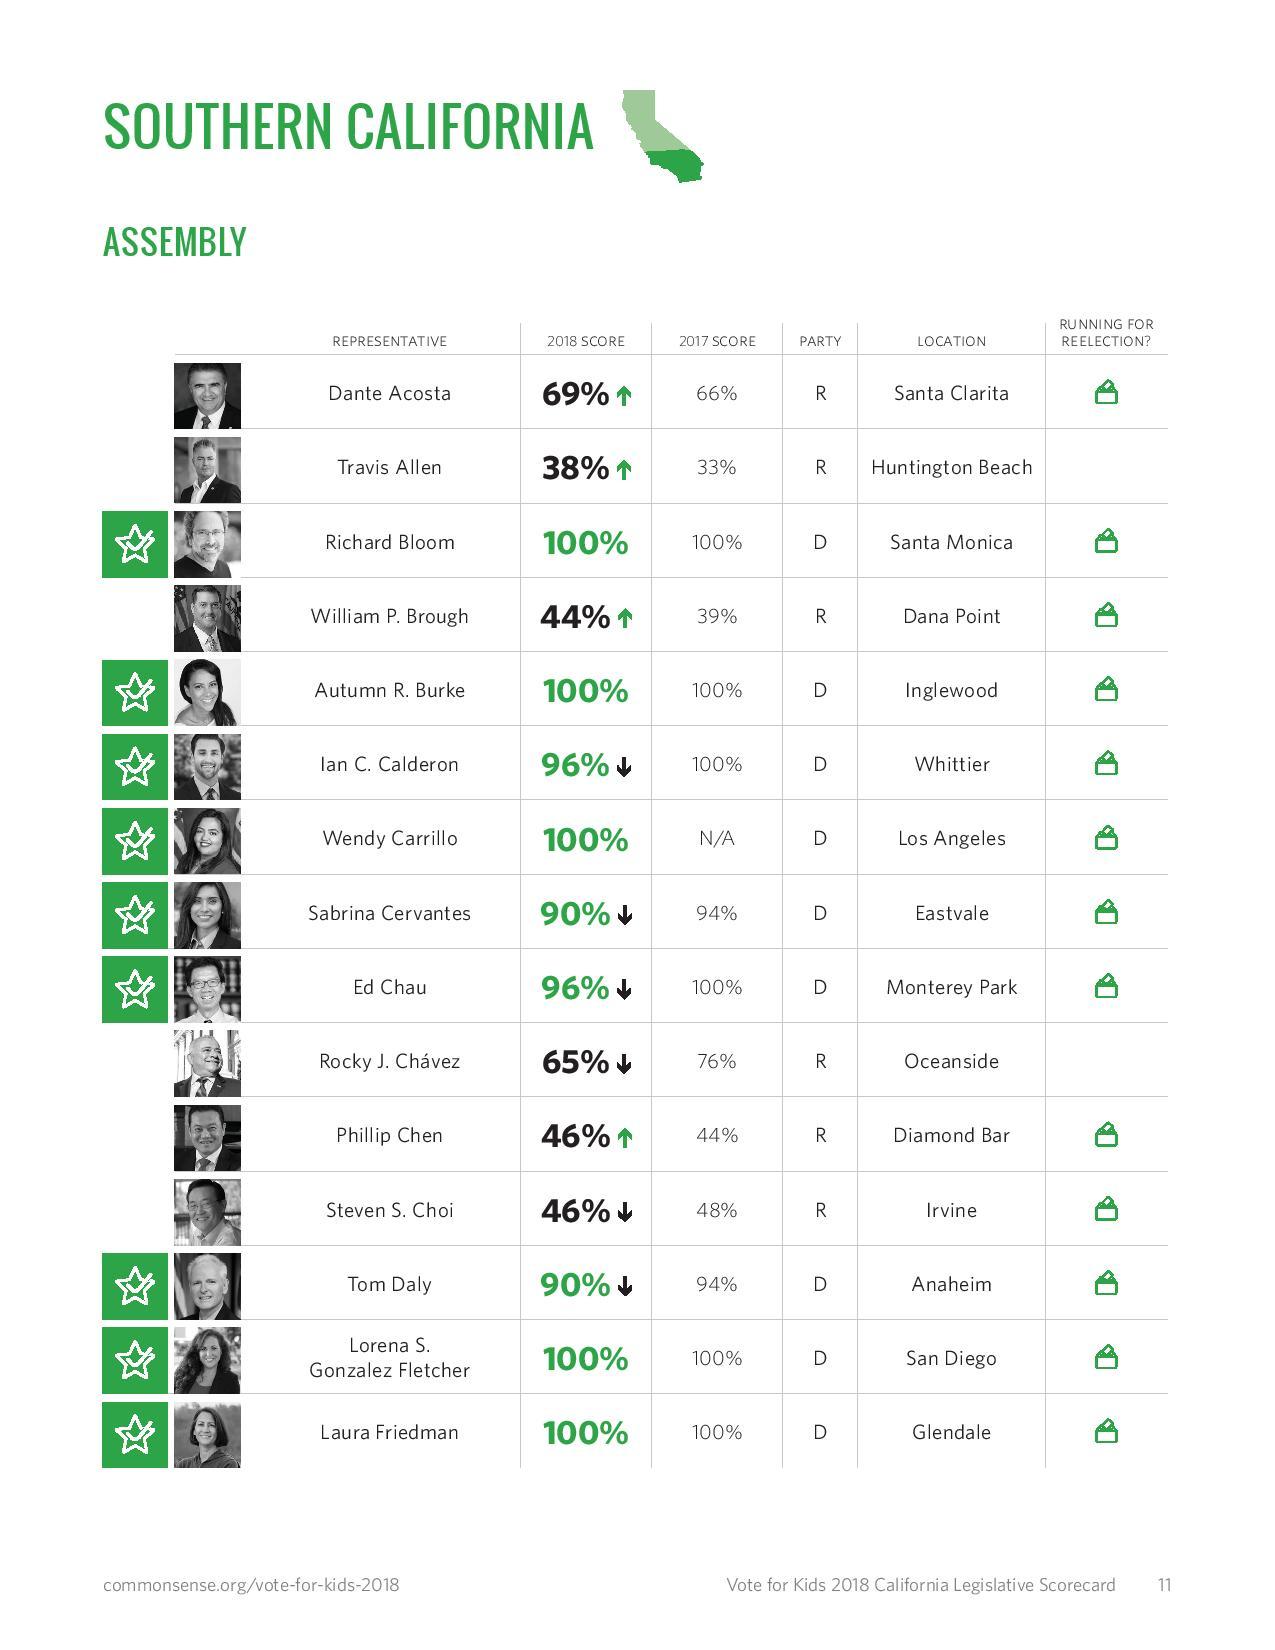 Vote For Kids 2018 - 100% - 2018 Election Scorecard (Based on 2017 voting record)